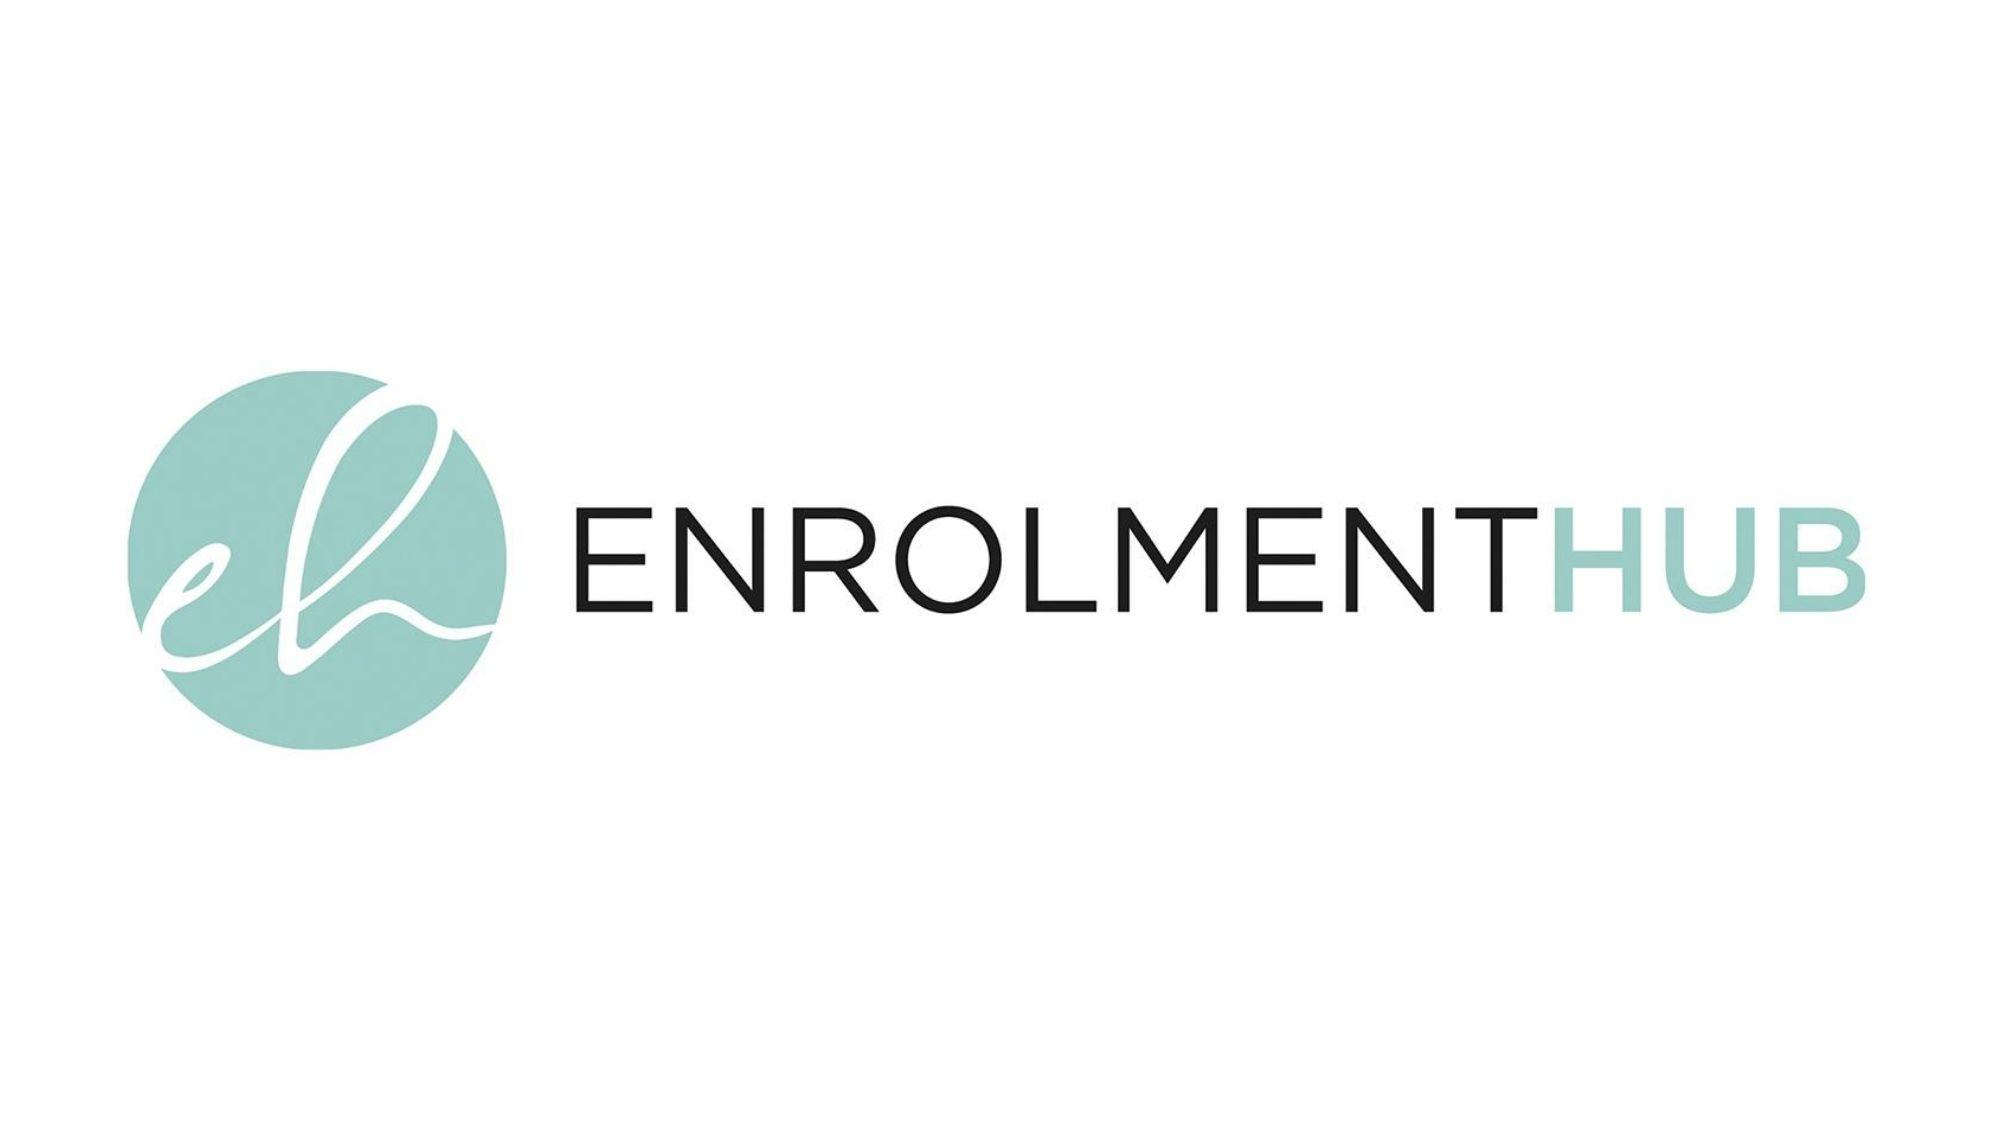 Enrolment Hub logo